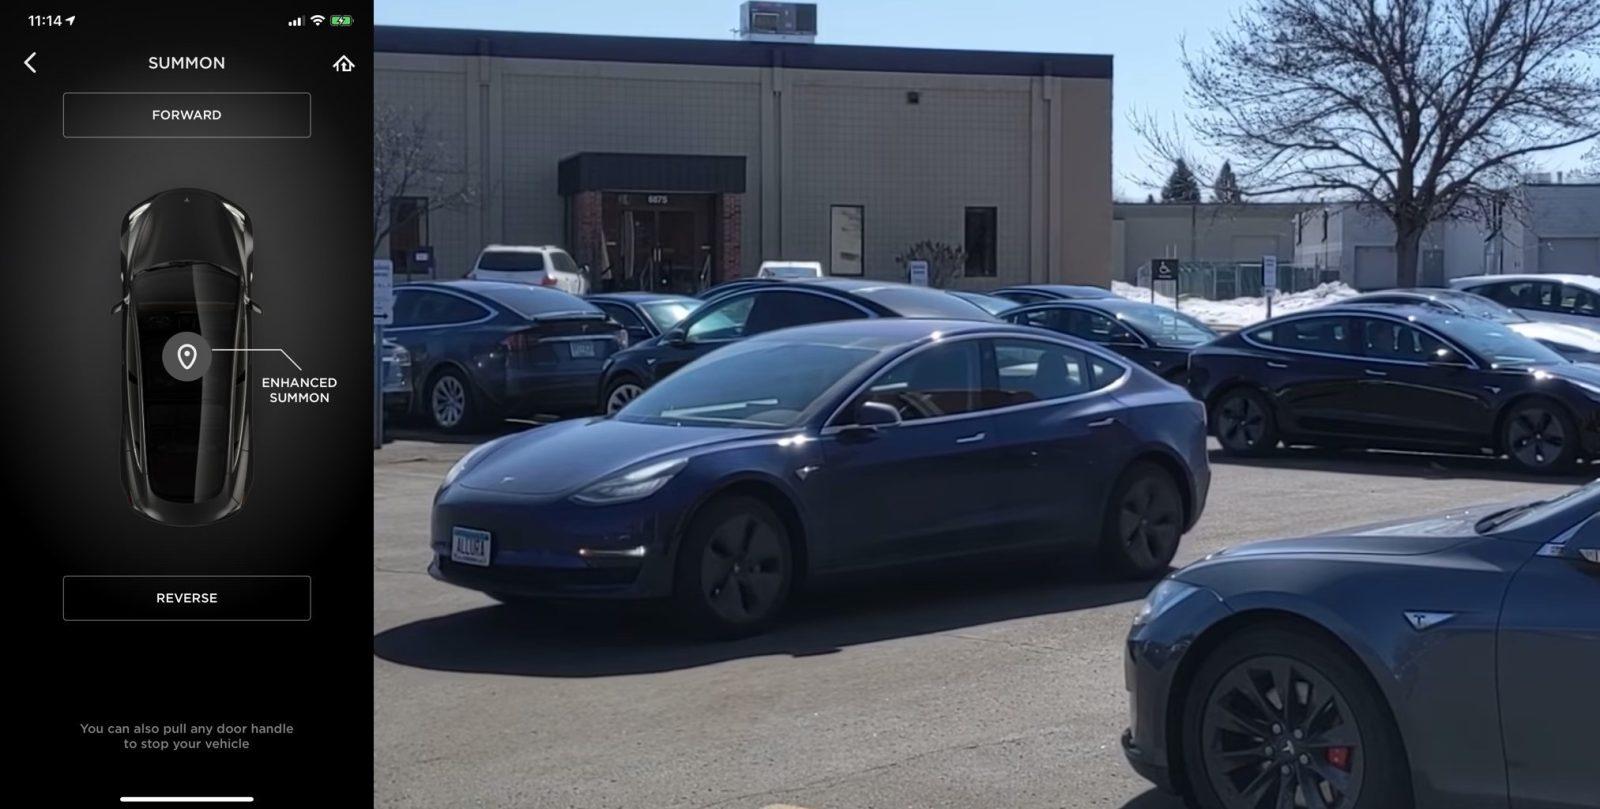 Watch first demonstration of Tesla's Enhanced Summon